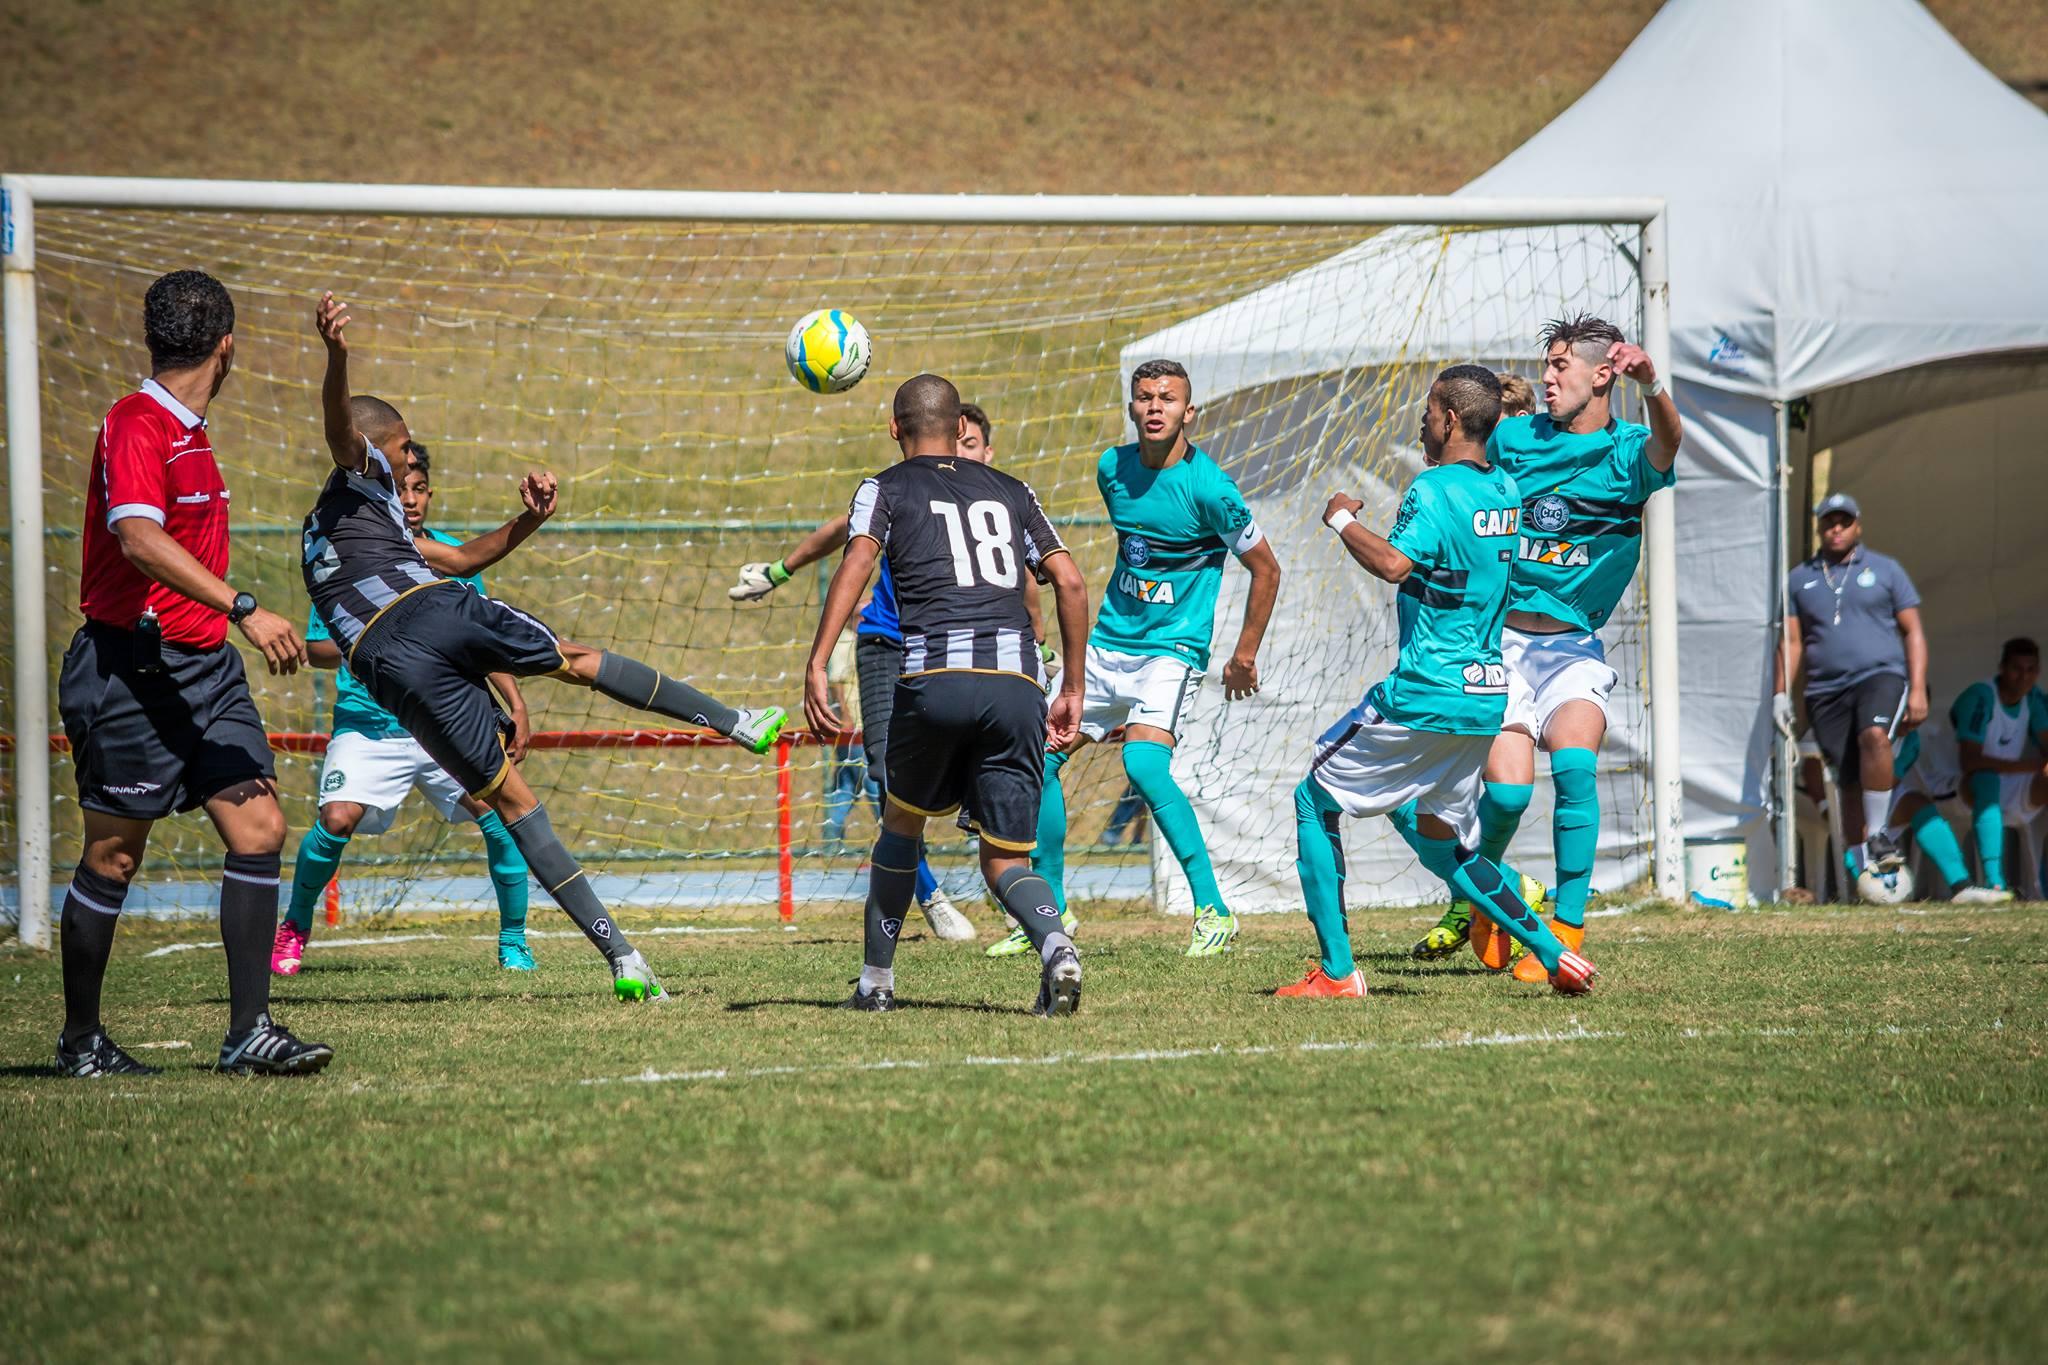 Taça BH: eficiente nos cruzamentos, Coritiba elimina o Botafogo na UFJF